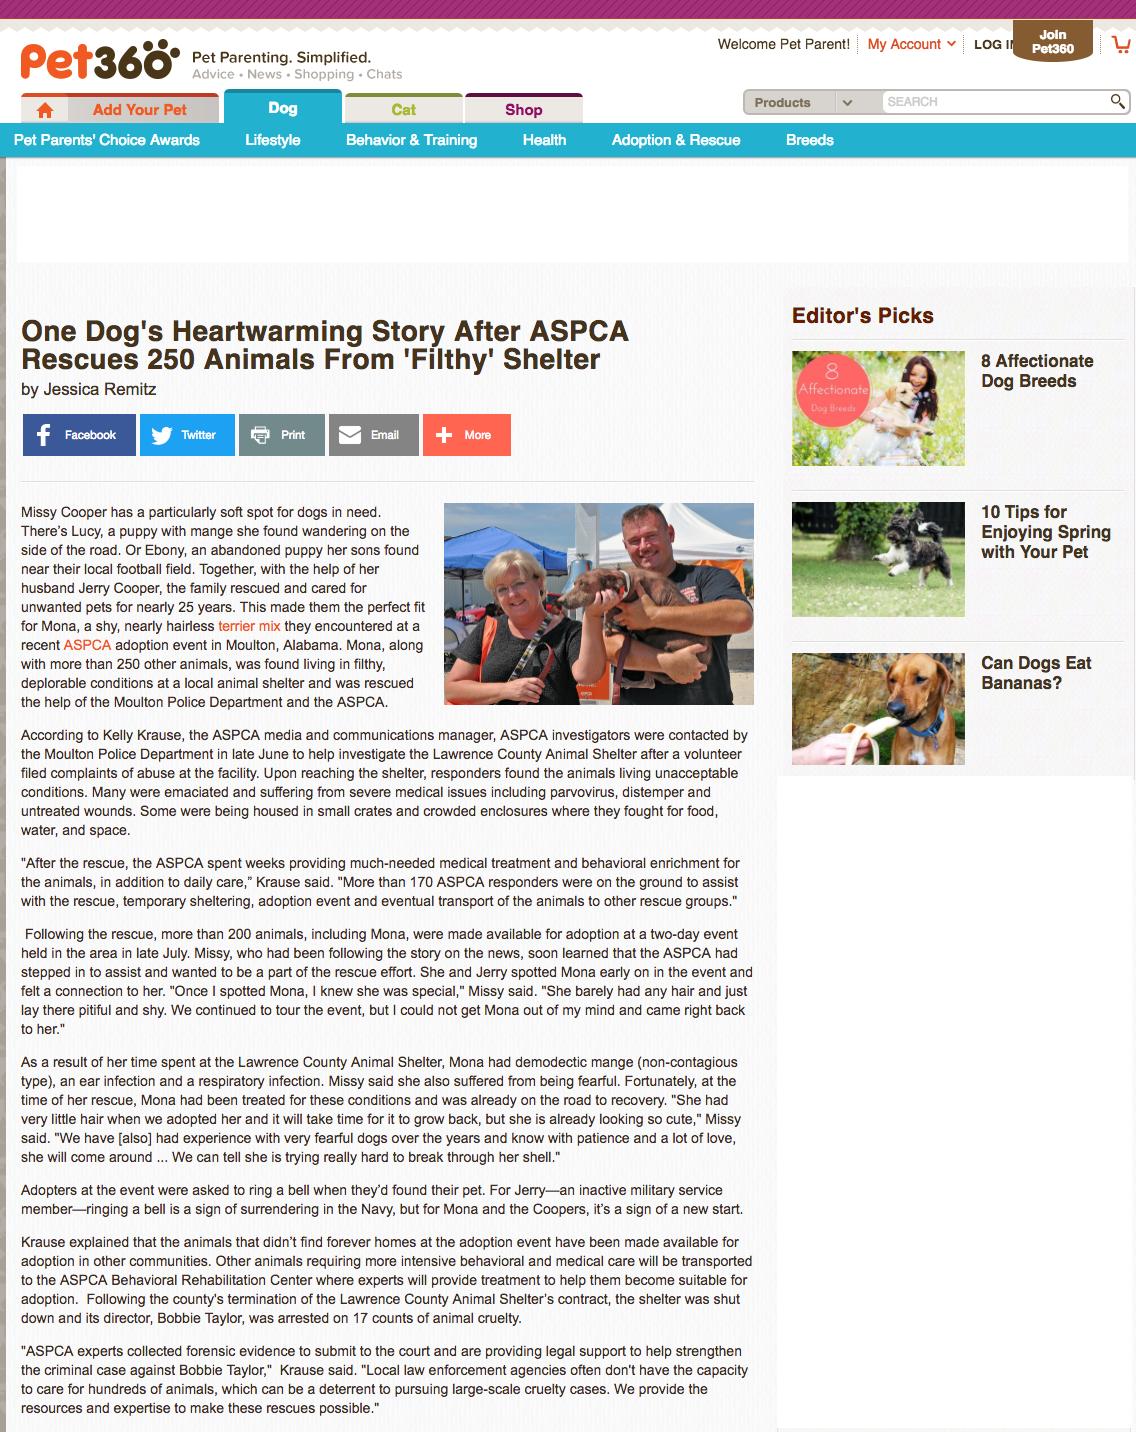 ASPCA Rescue_Pet360.png